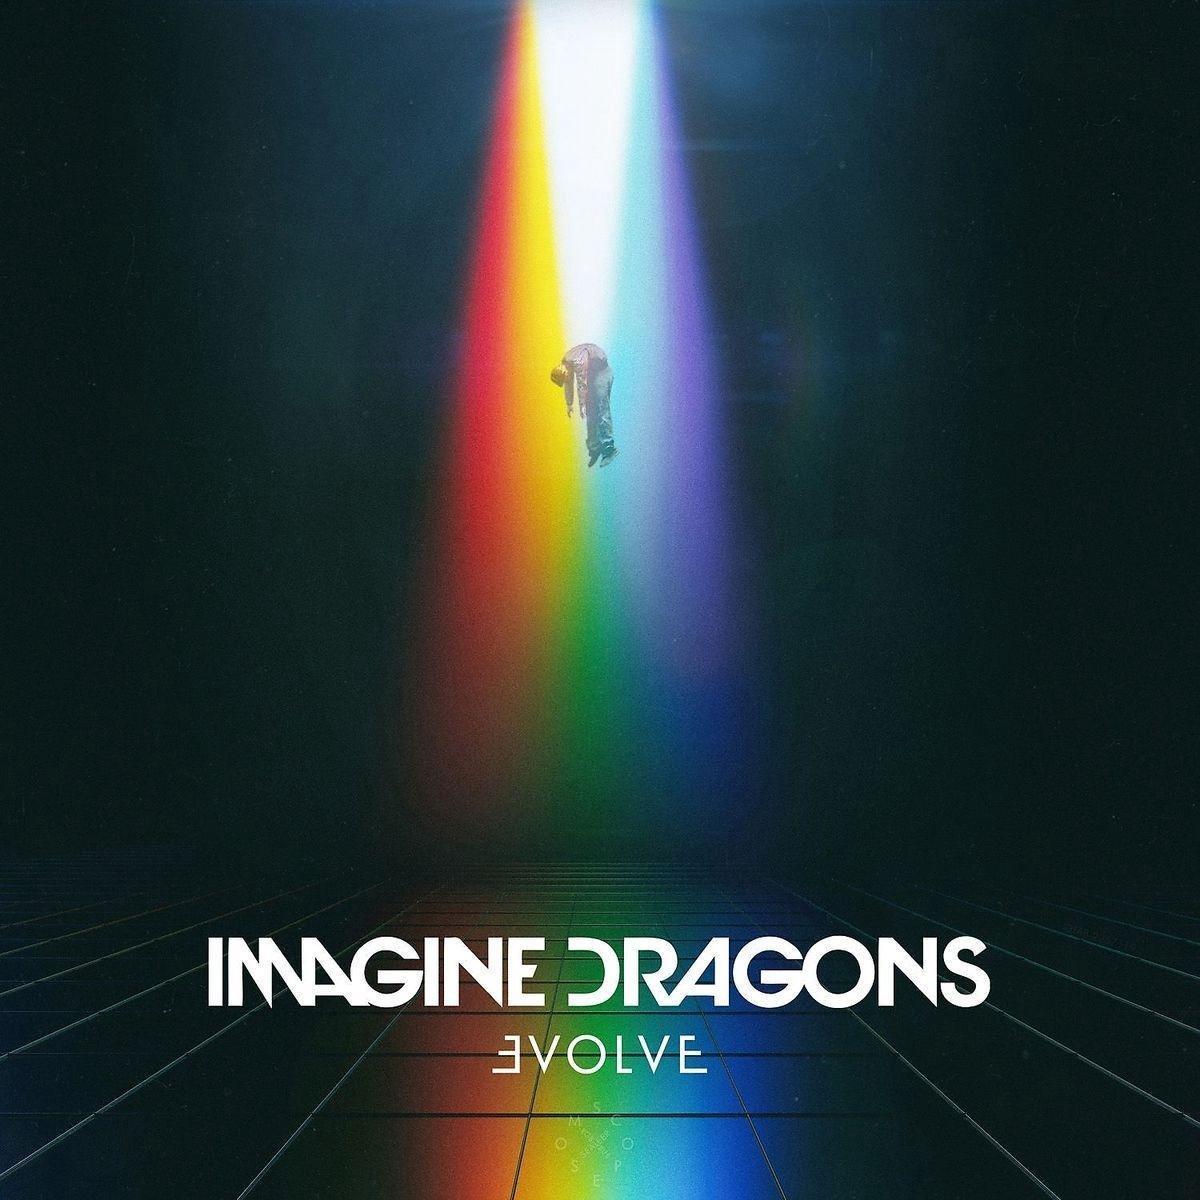 Evolve (LP) - Imagine Dragons